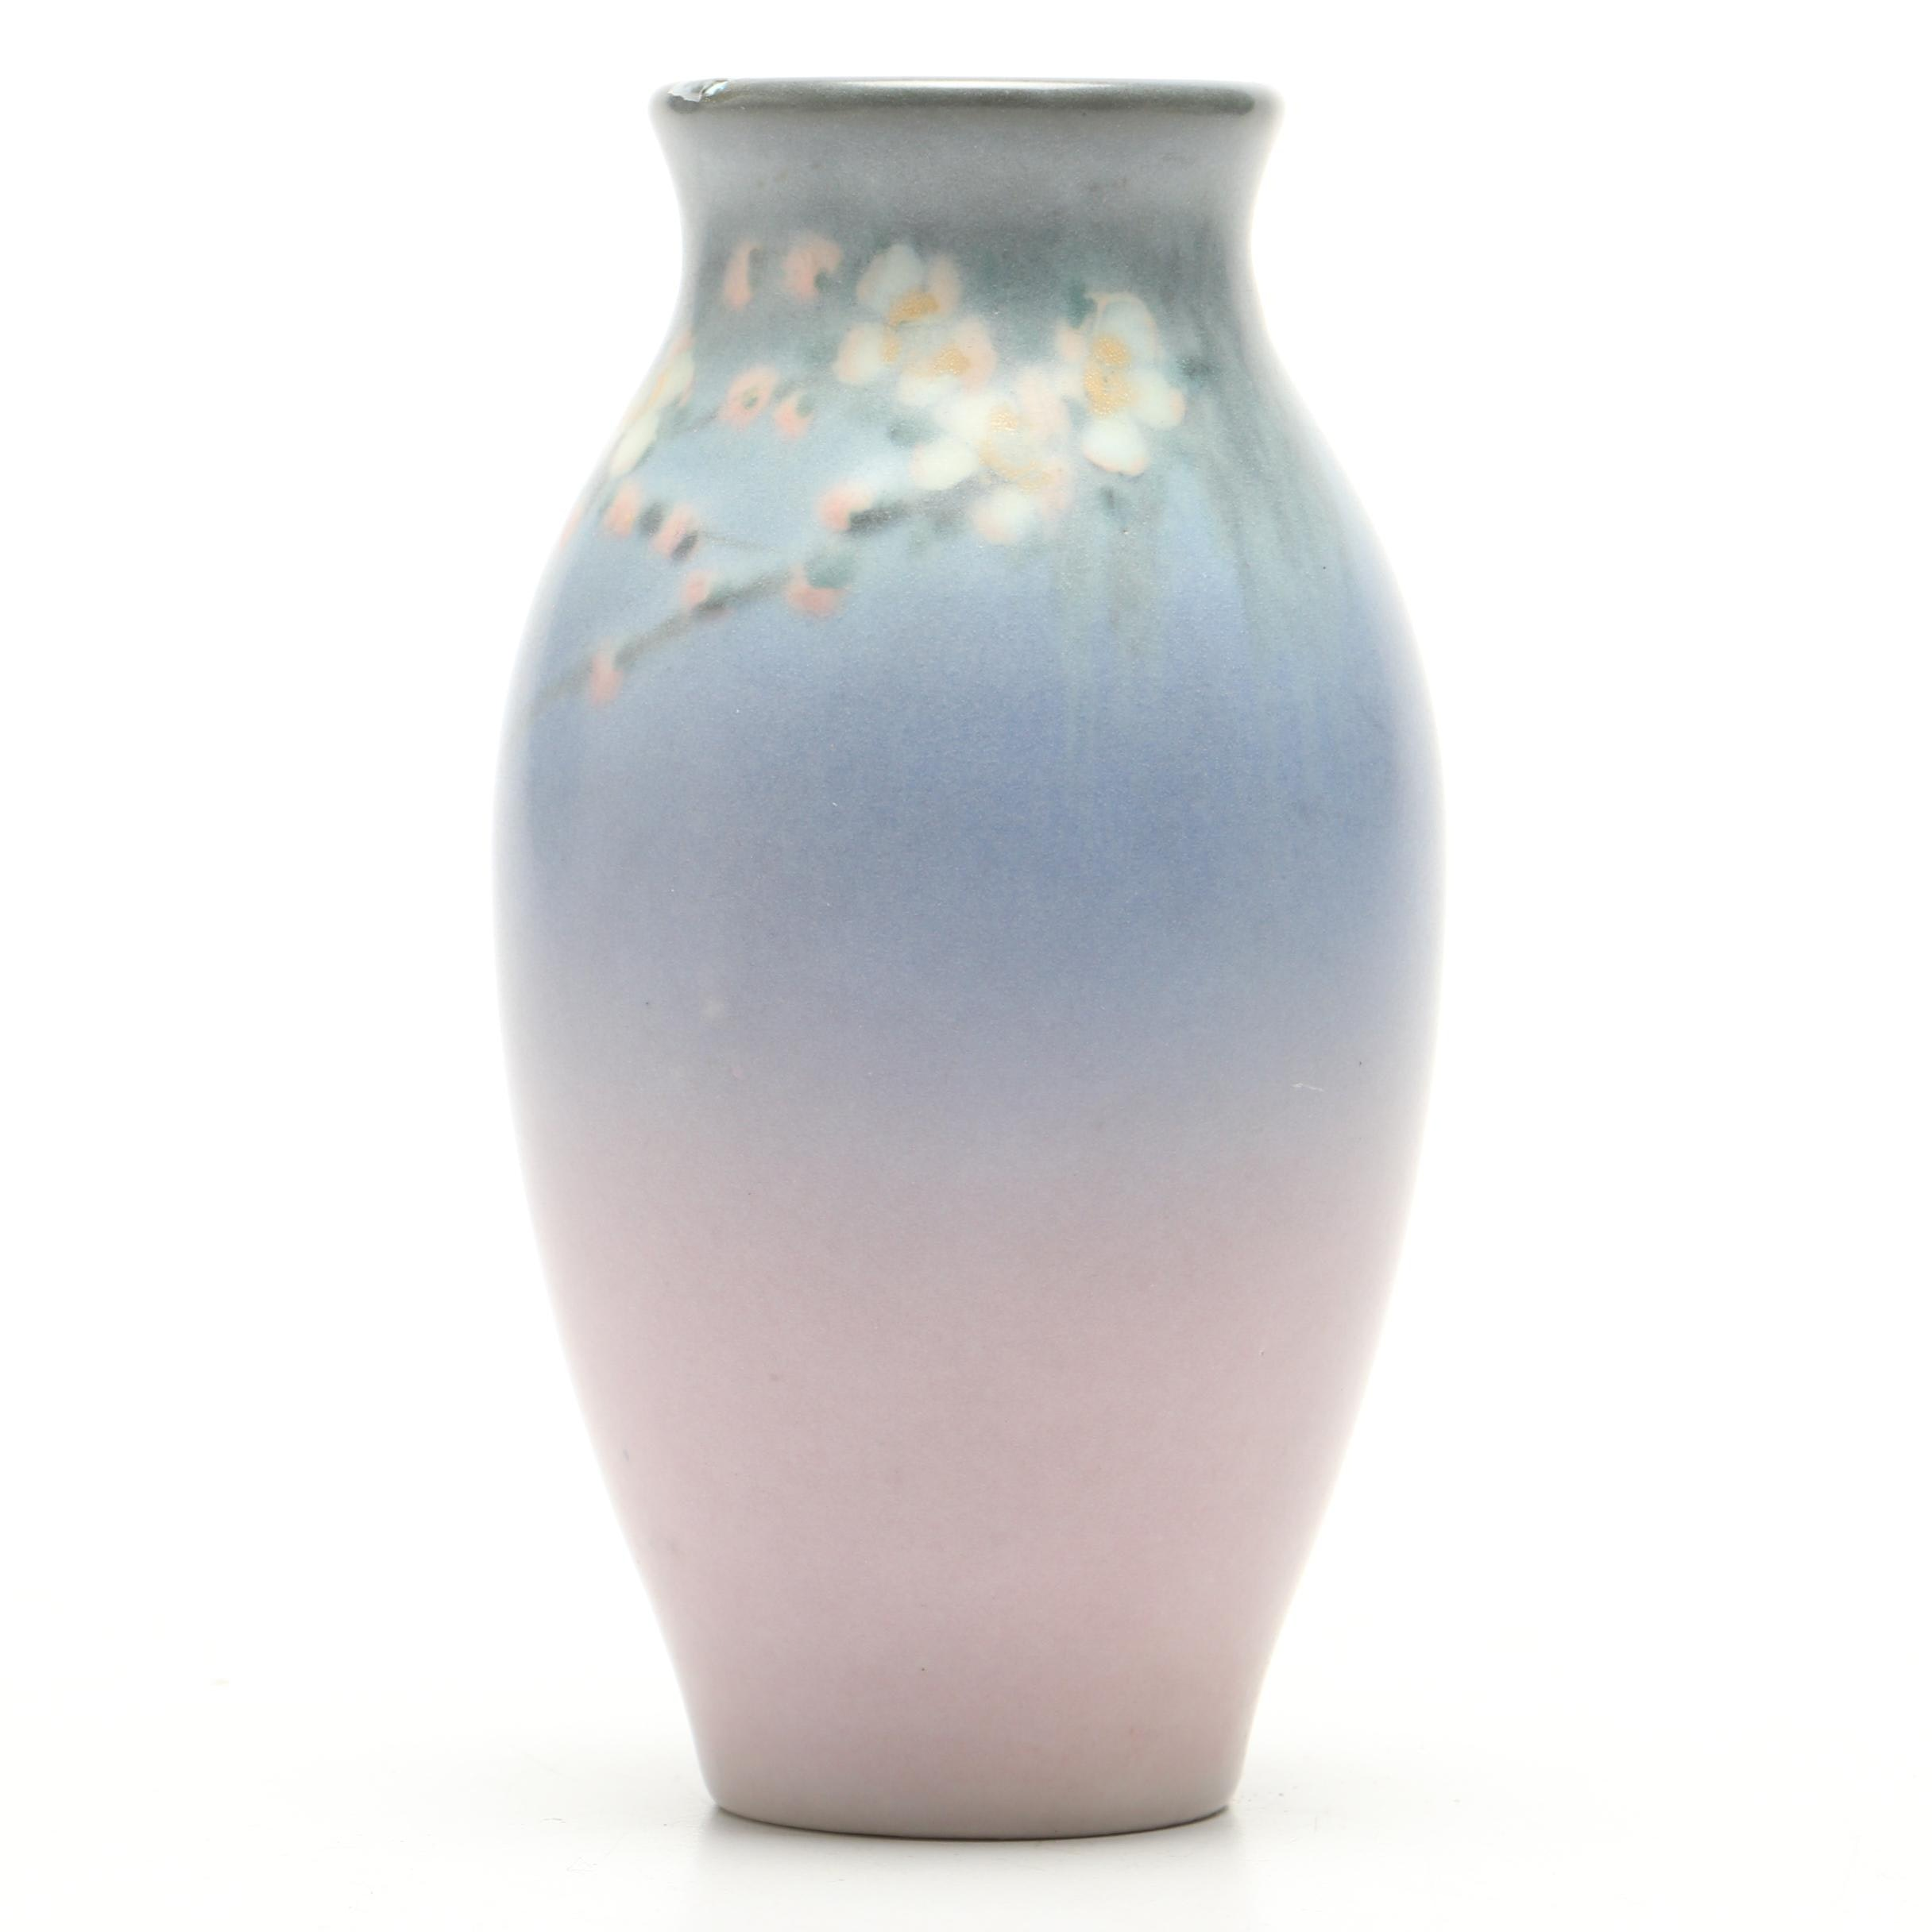 E.T. Hurley Rookwood Pottery Vellum Glazed Vase, 1928